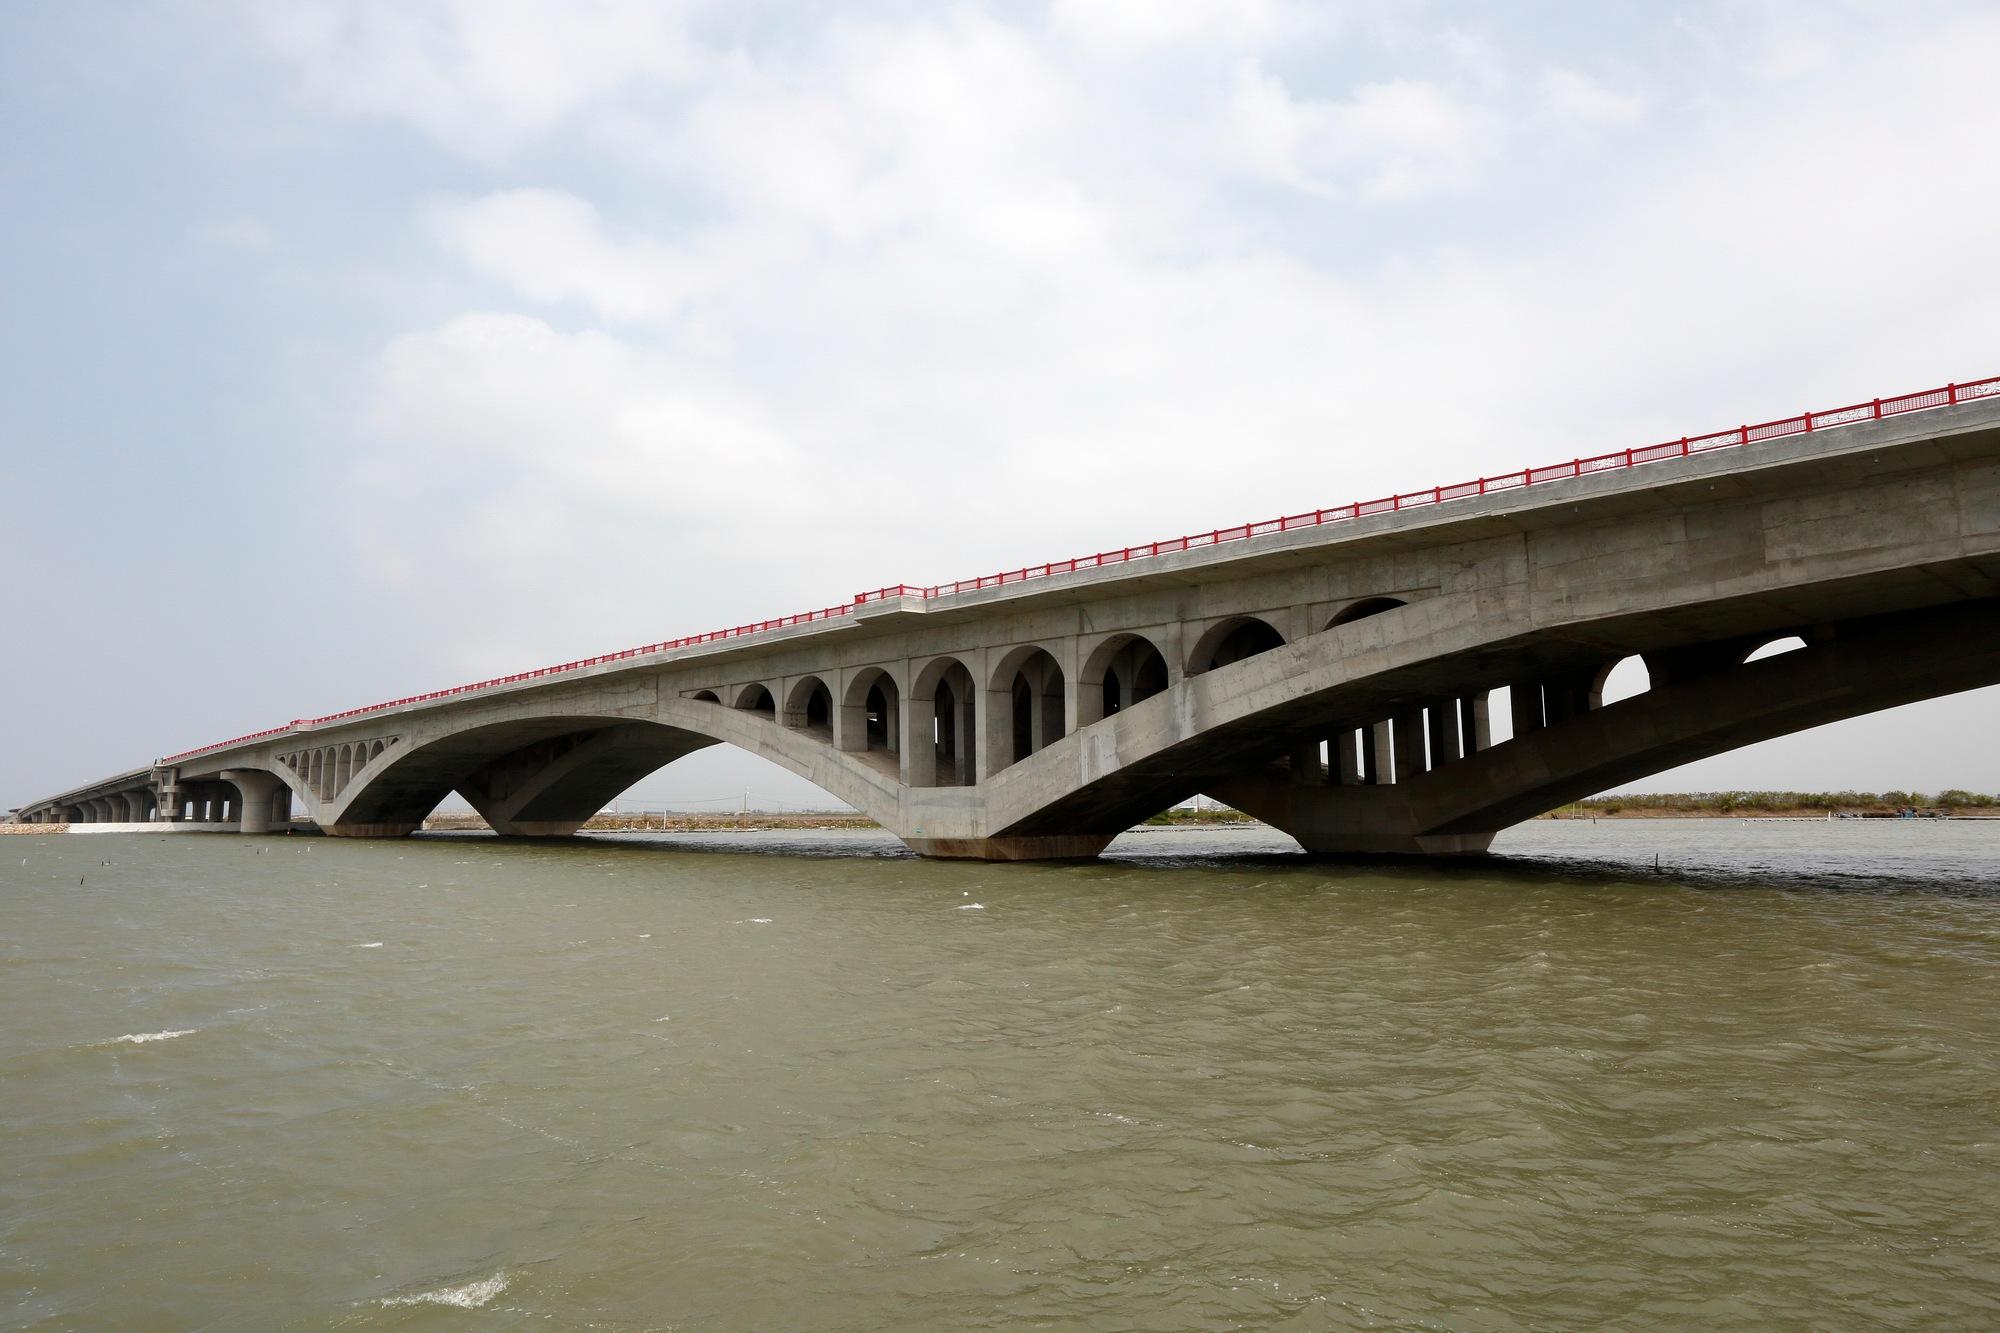 NEW HIGHWAY BRIDGE by chaoyang chan